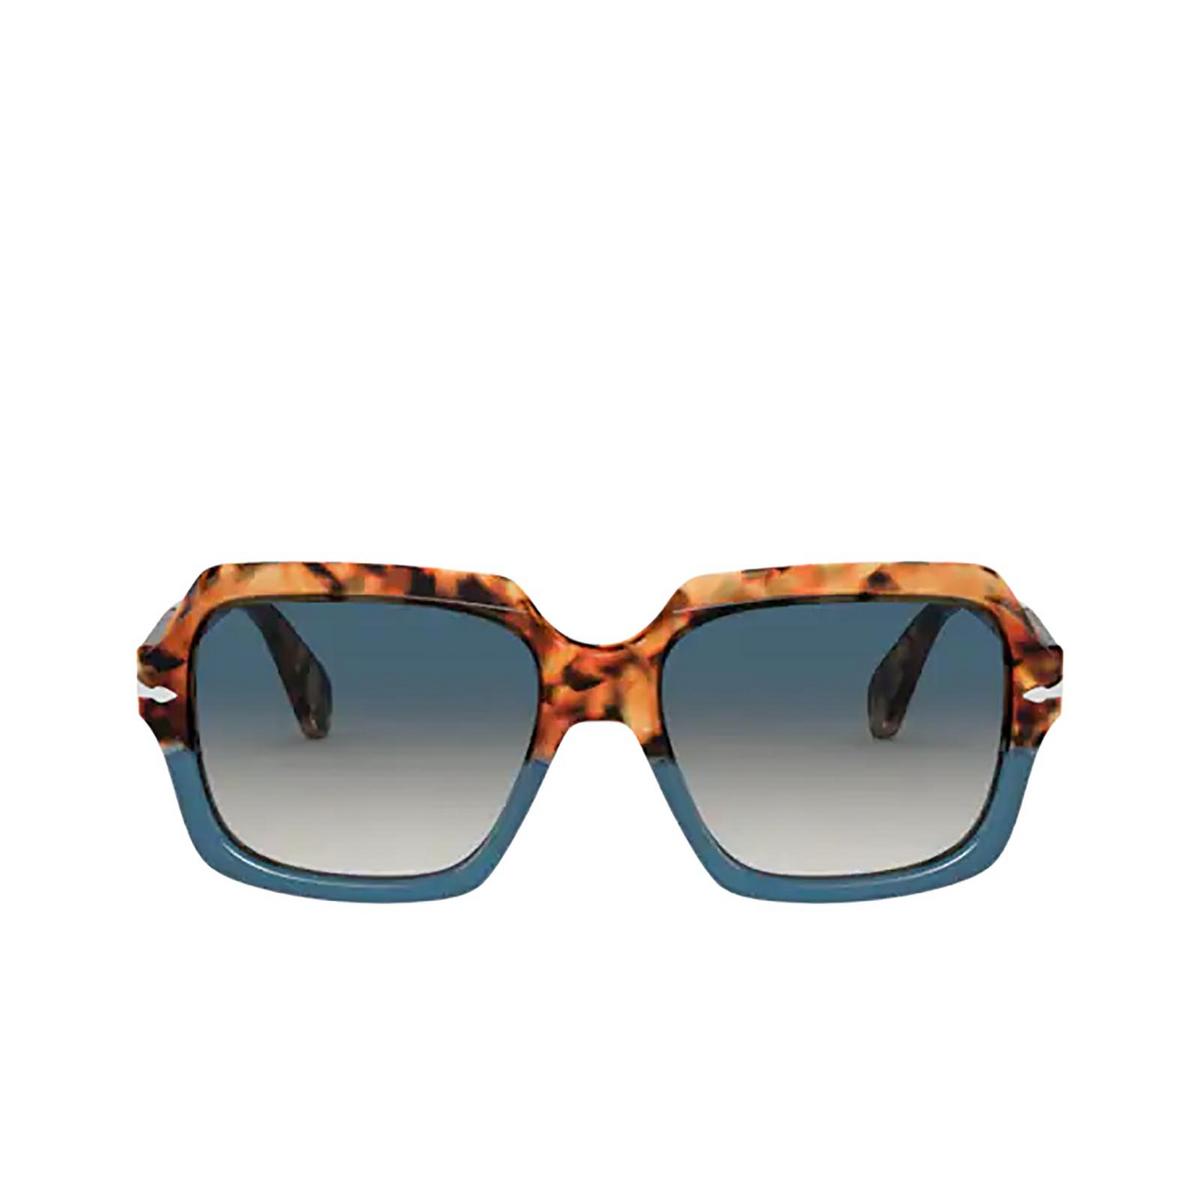 Persol® Square Sunglasses: PO0581S color Brown Tortoise & Opal Blue 112032 - front view.